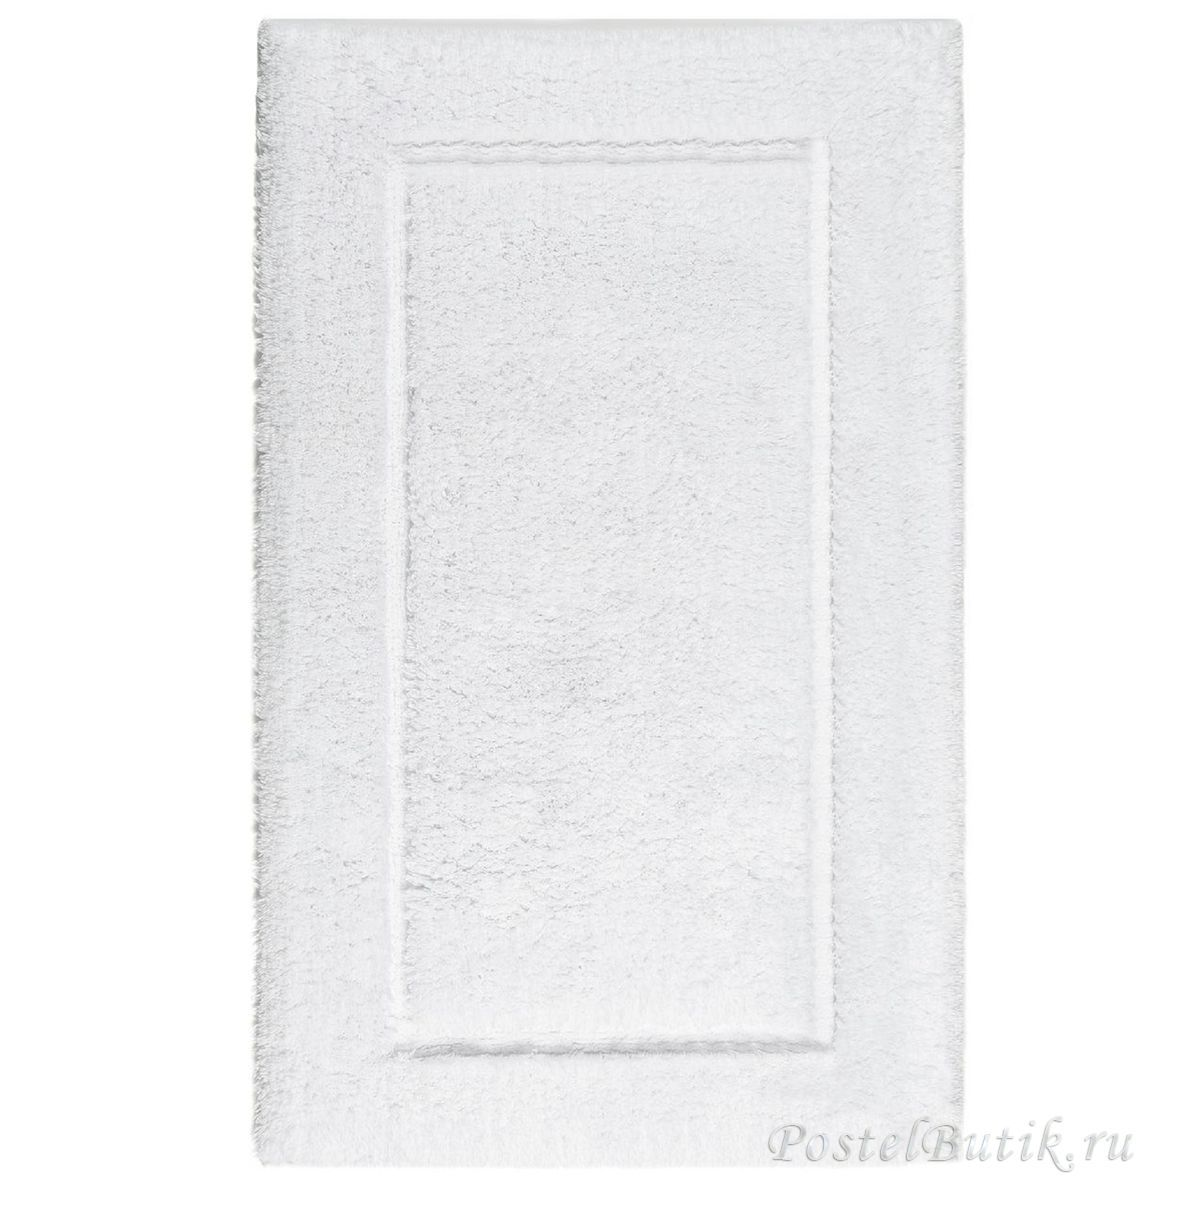 Коврики для ванной Коврик для ванной 51x81 Kassatex Classic Egyptian White elitnyy-kovrik-dlya-vannoy-classic-egyptian-white-ot-kassatex-portugaliy.jpeg